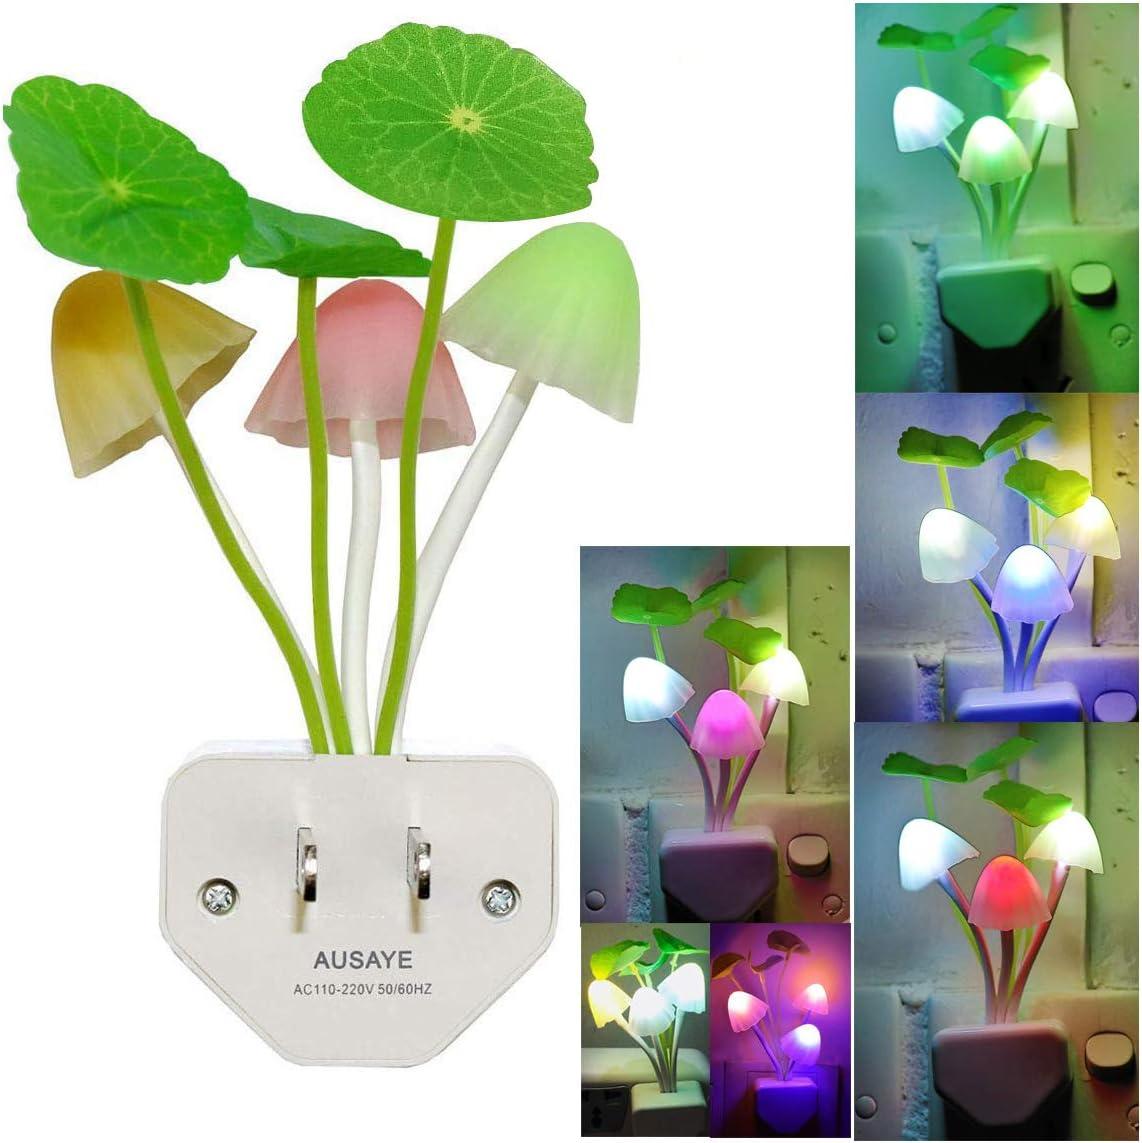 Led Night Light w/Smart Sensor,AUSAYE 0.6W Plug-in Night Lights for Kids Adults Cute Mushroom Night Light Bedroom Home Decor Light Wall Lamps NightLight